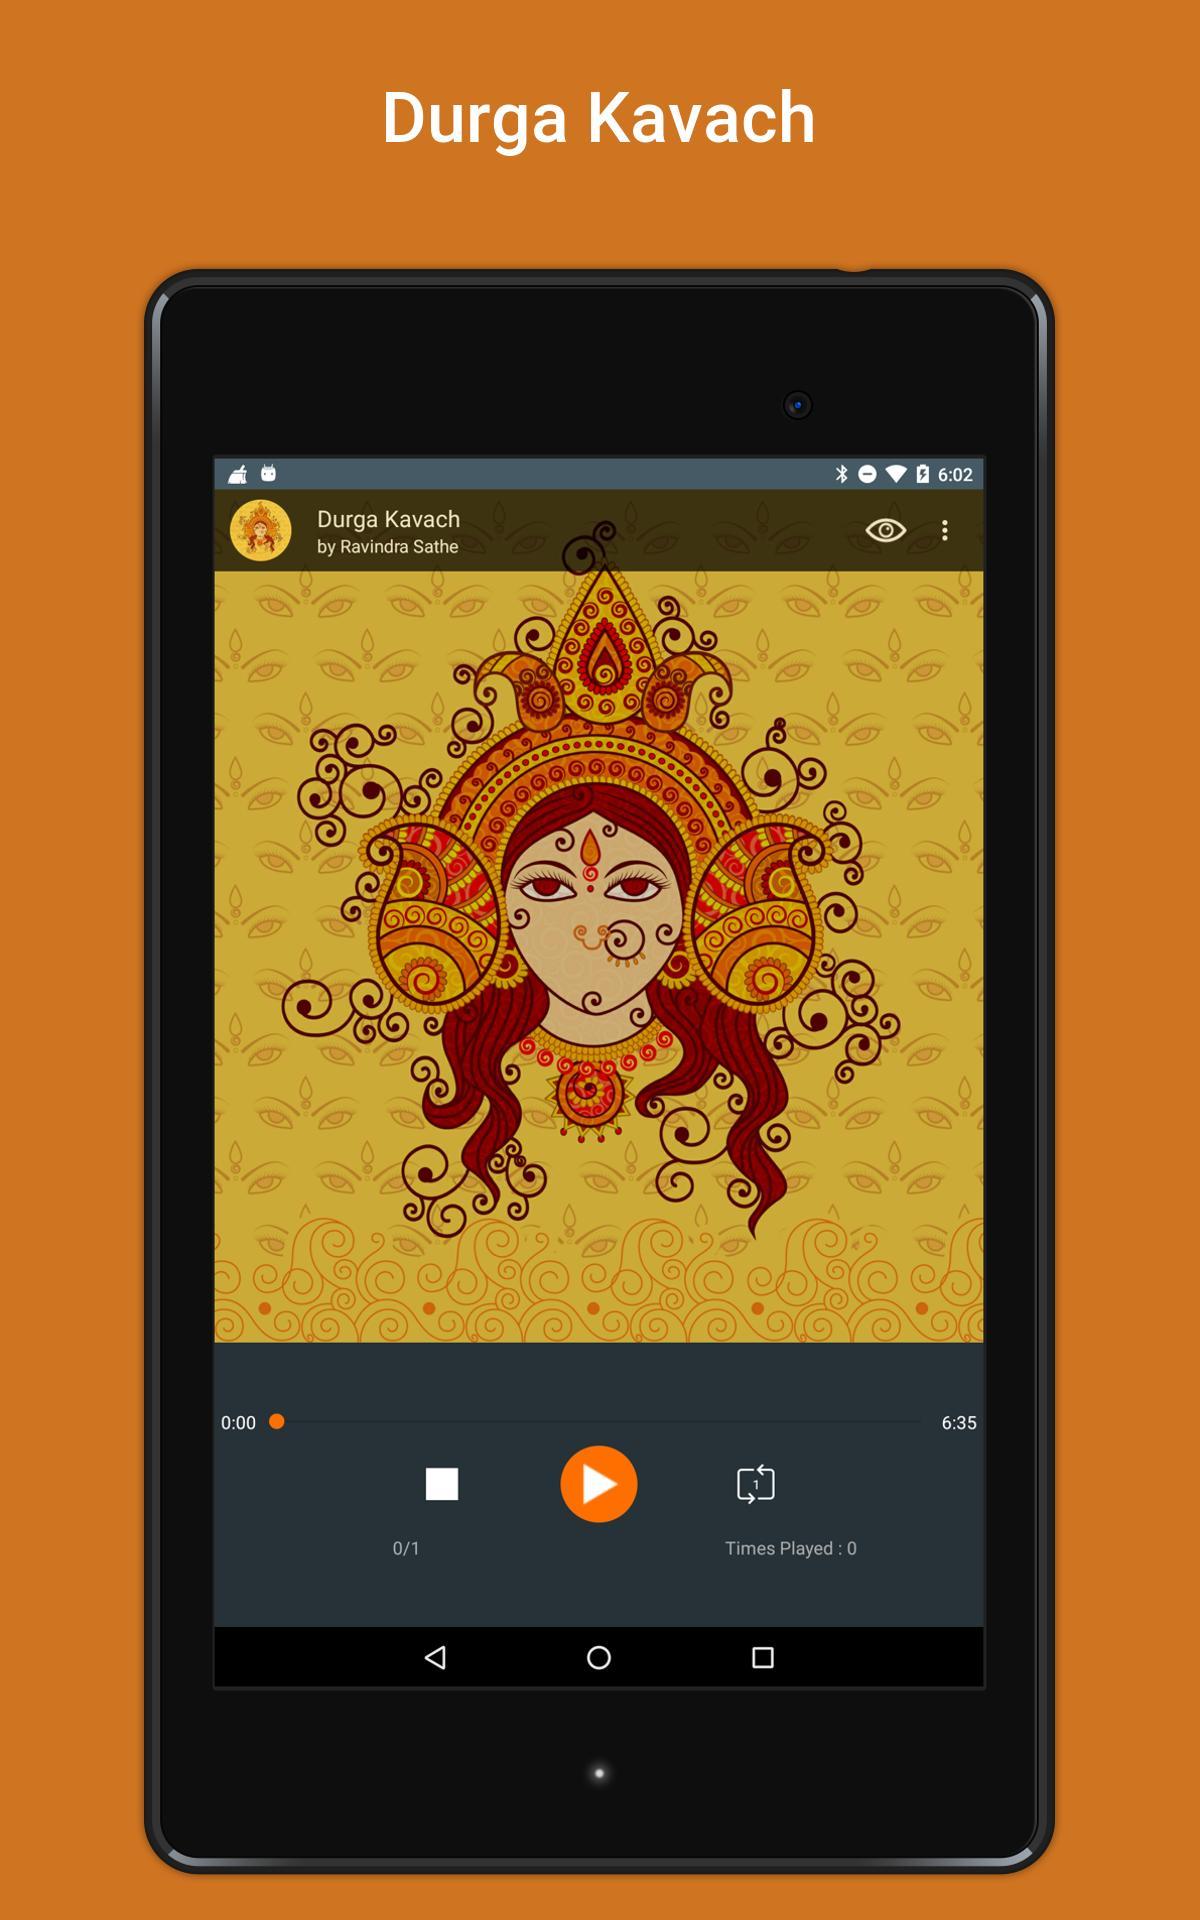 Durga Kavach Benefits